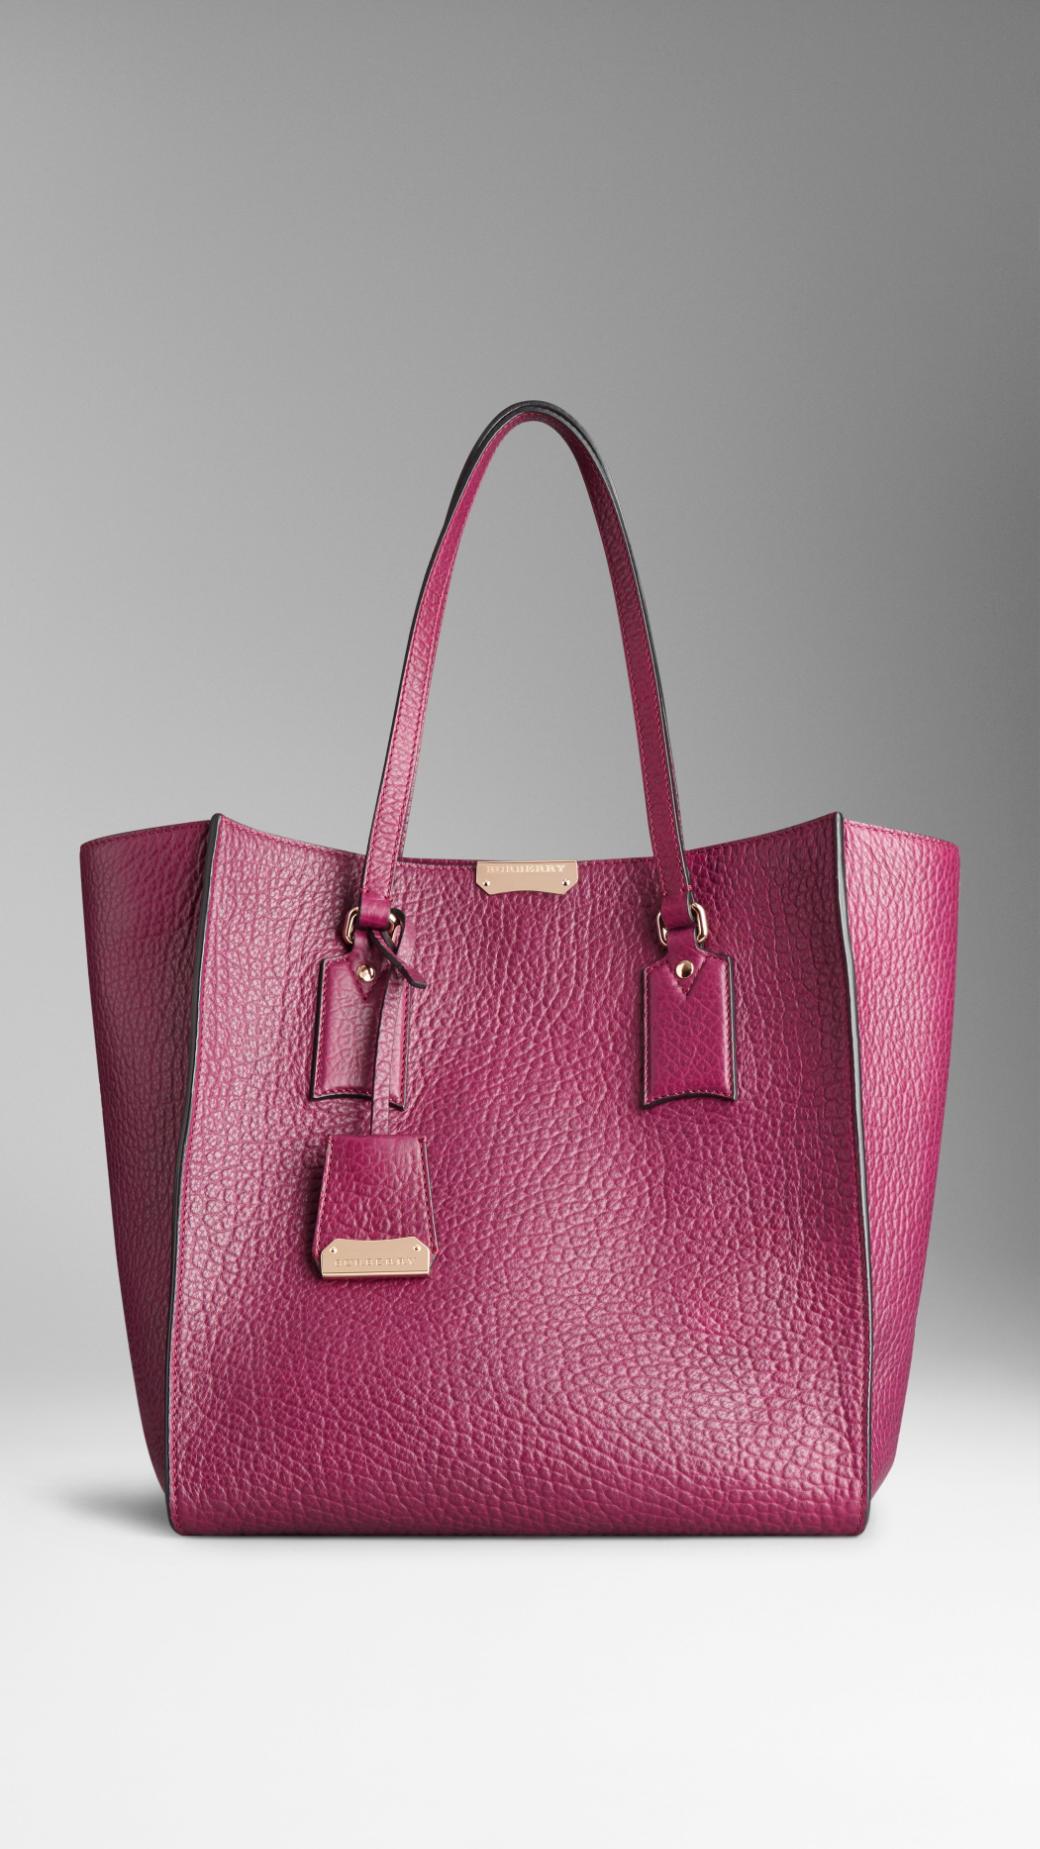 b3cdd7710b38 Lyst - Burberry Medium Heritage Grain Leather Tote Bag in Pink